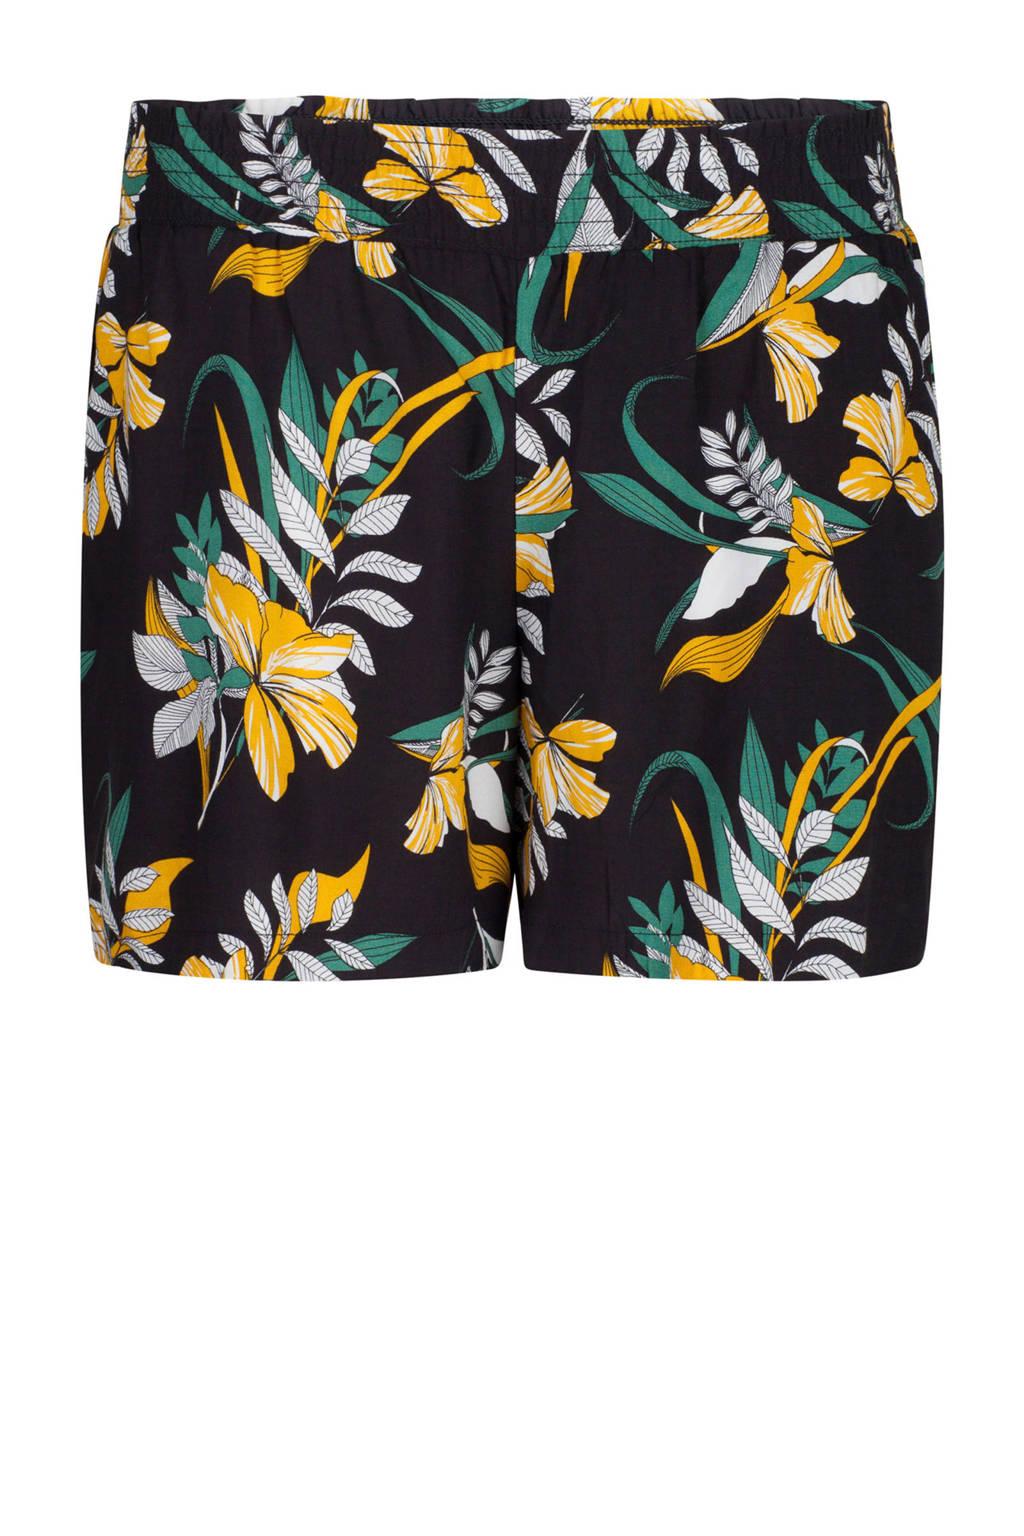 WE Fashion straight fit short met bladprint zwart/geel/groen, Zwart/geel/groen